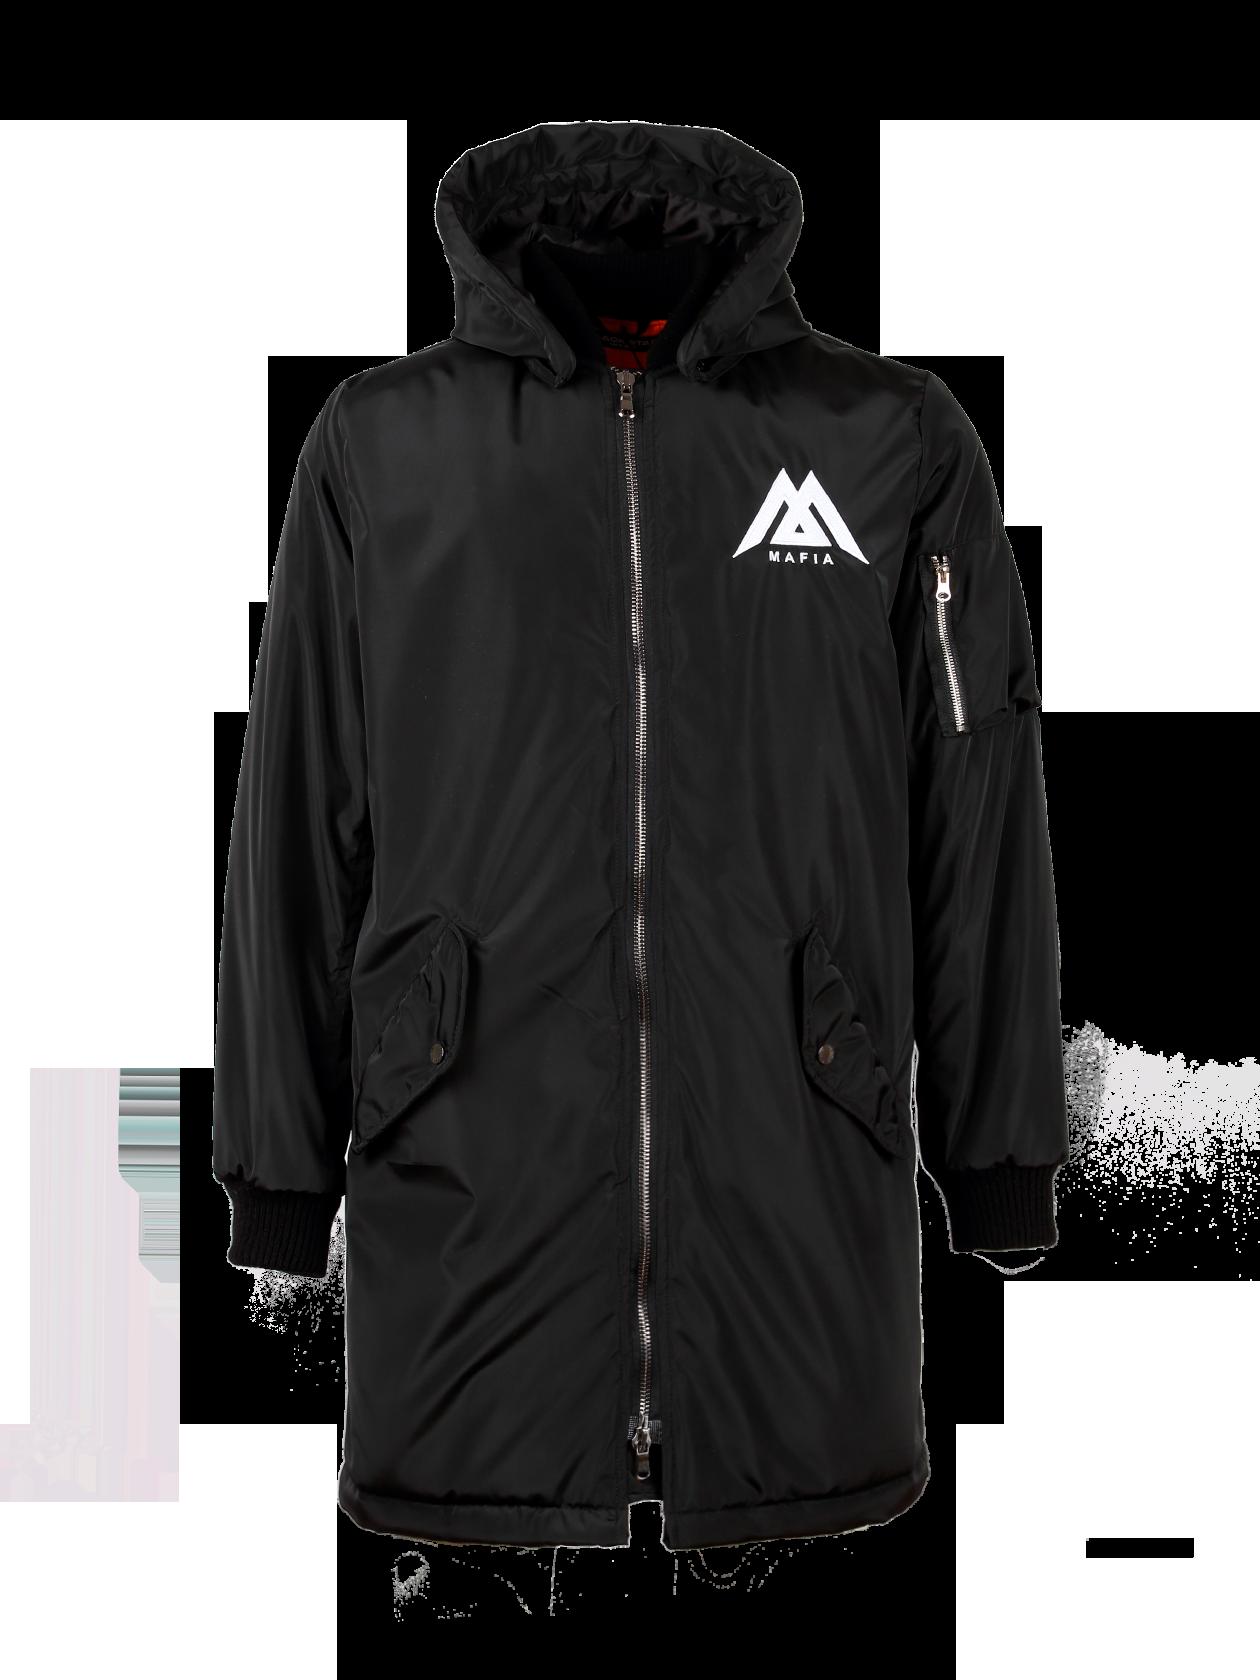 Зимняя куртка-бомбер мужская Black Star Mafia